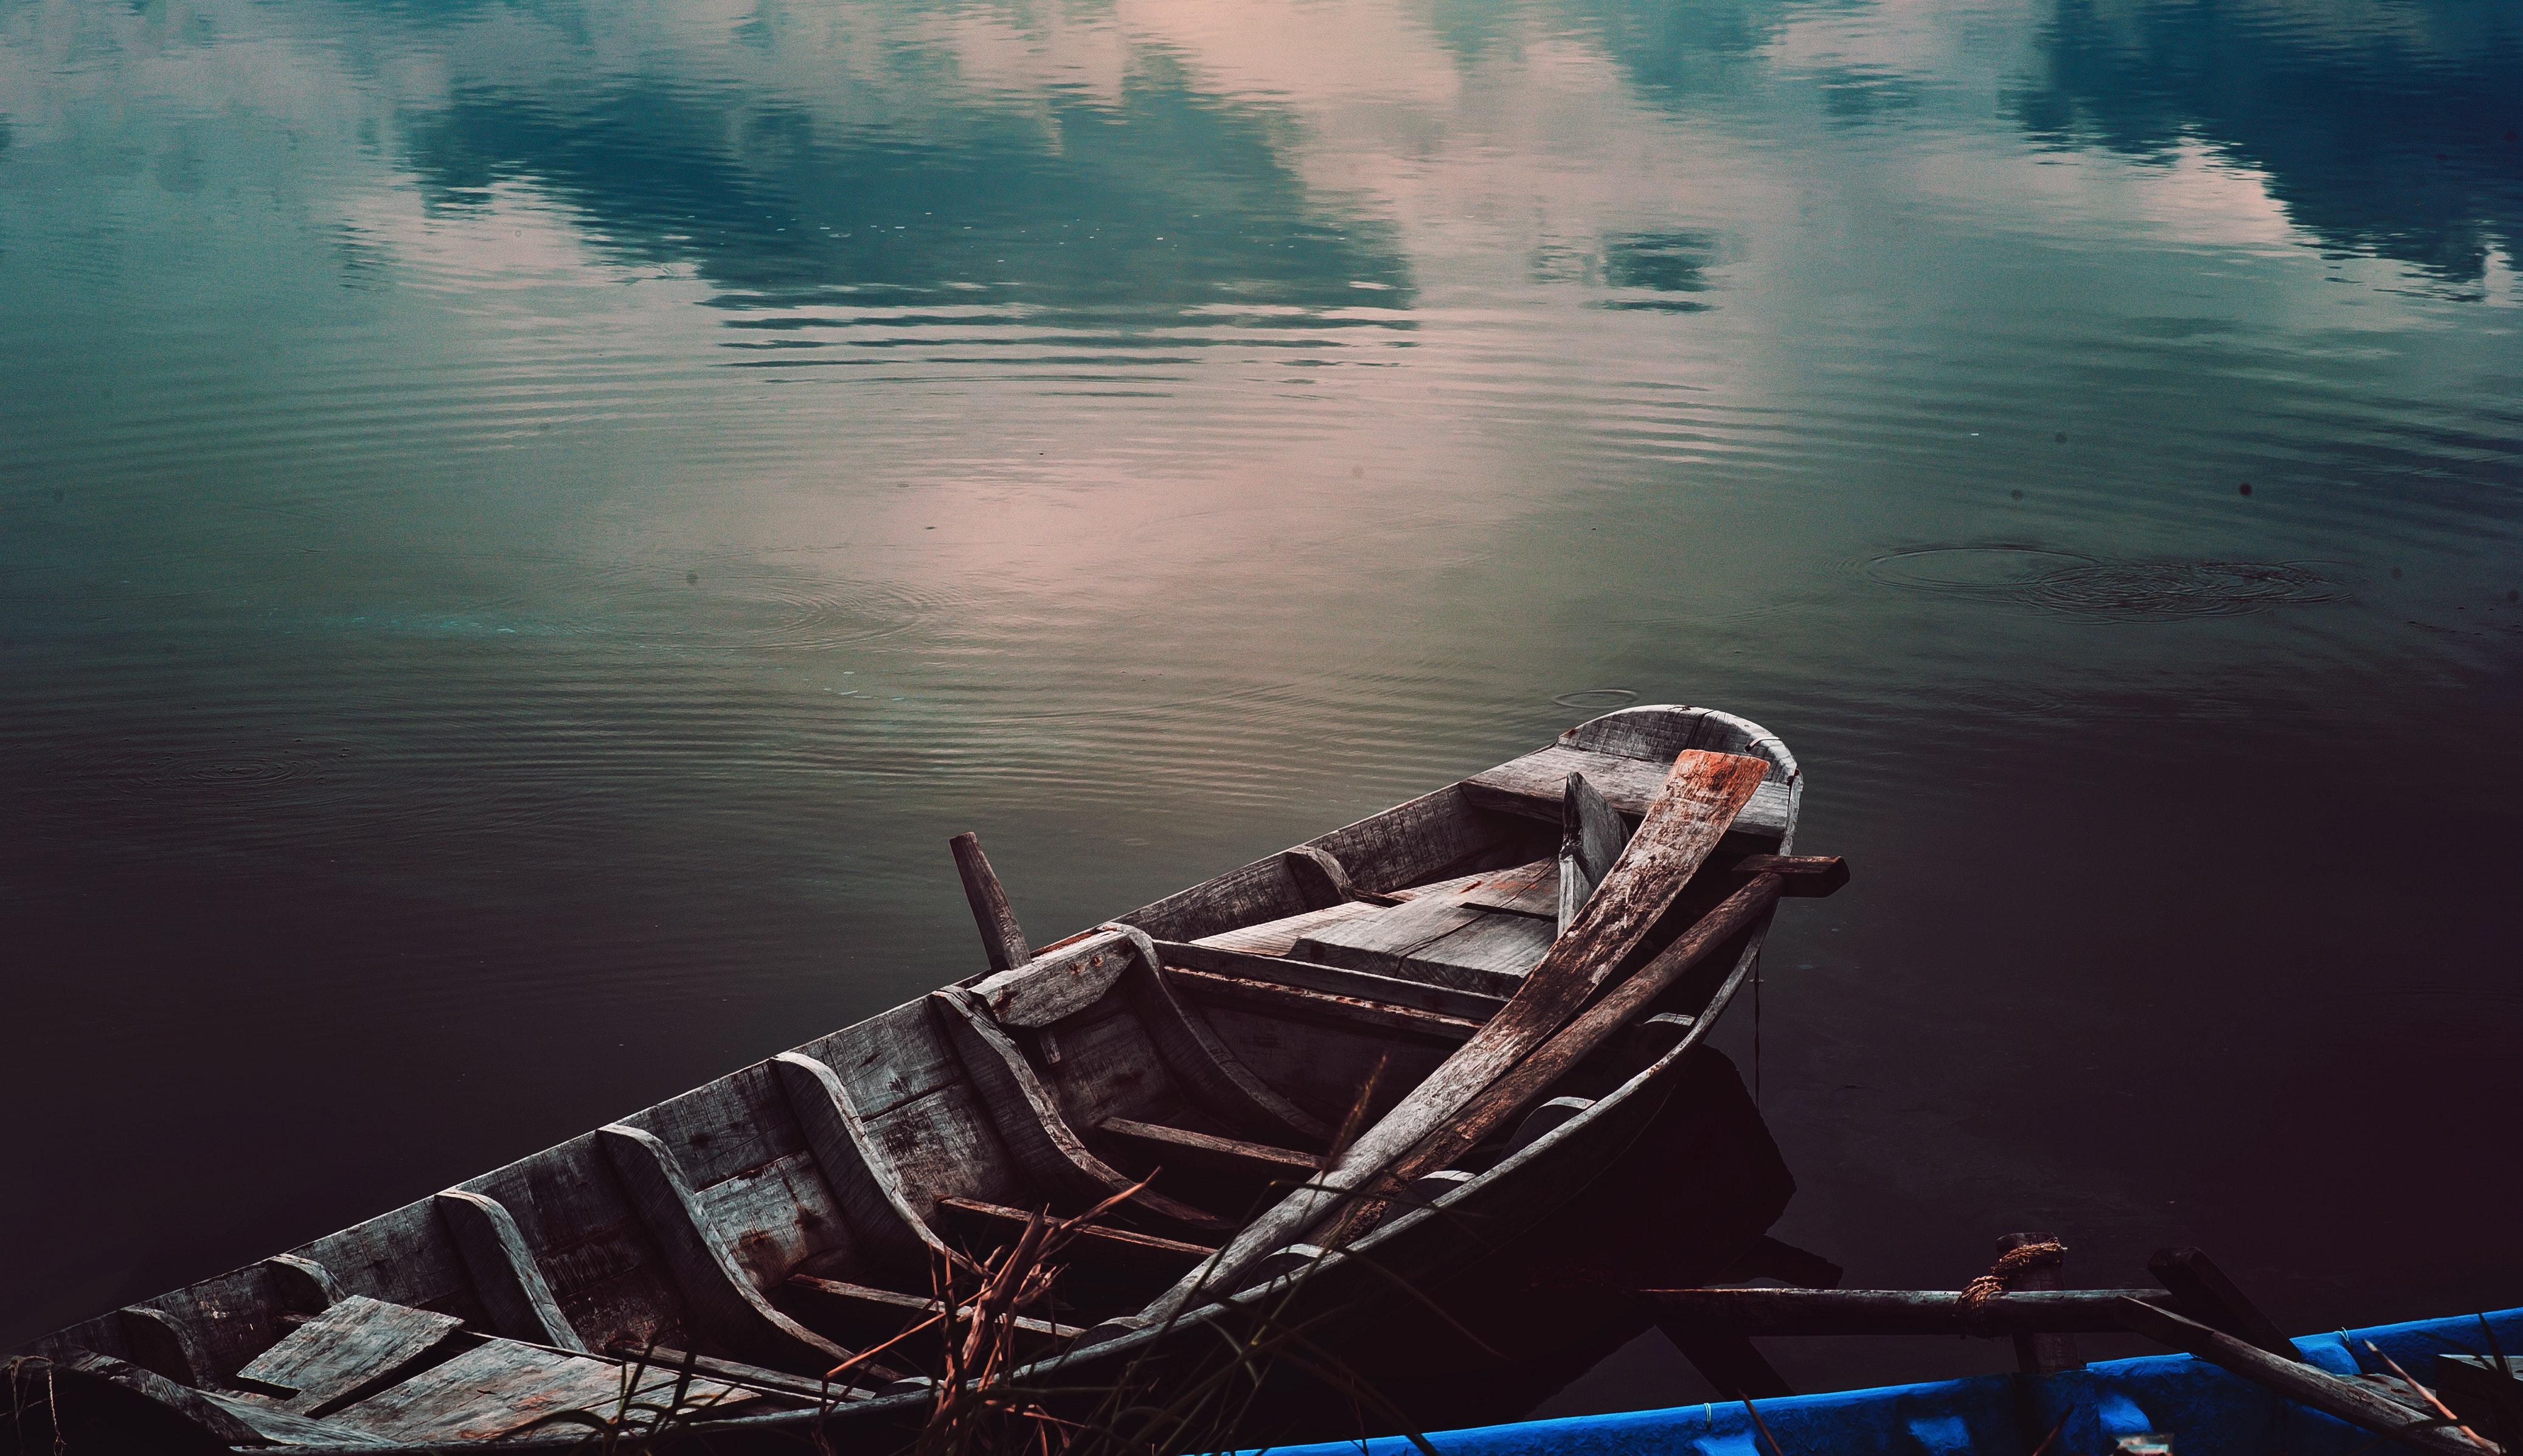 Red Canoe 183 Free Stock Photo